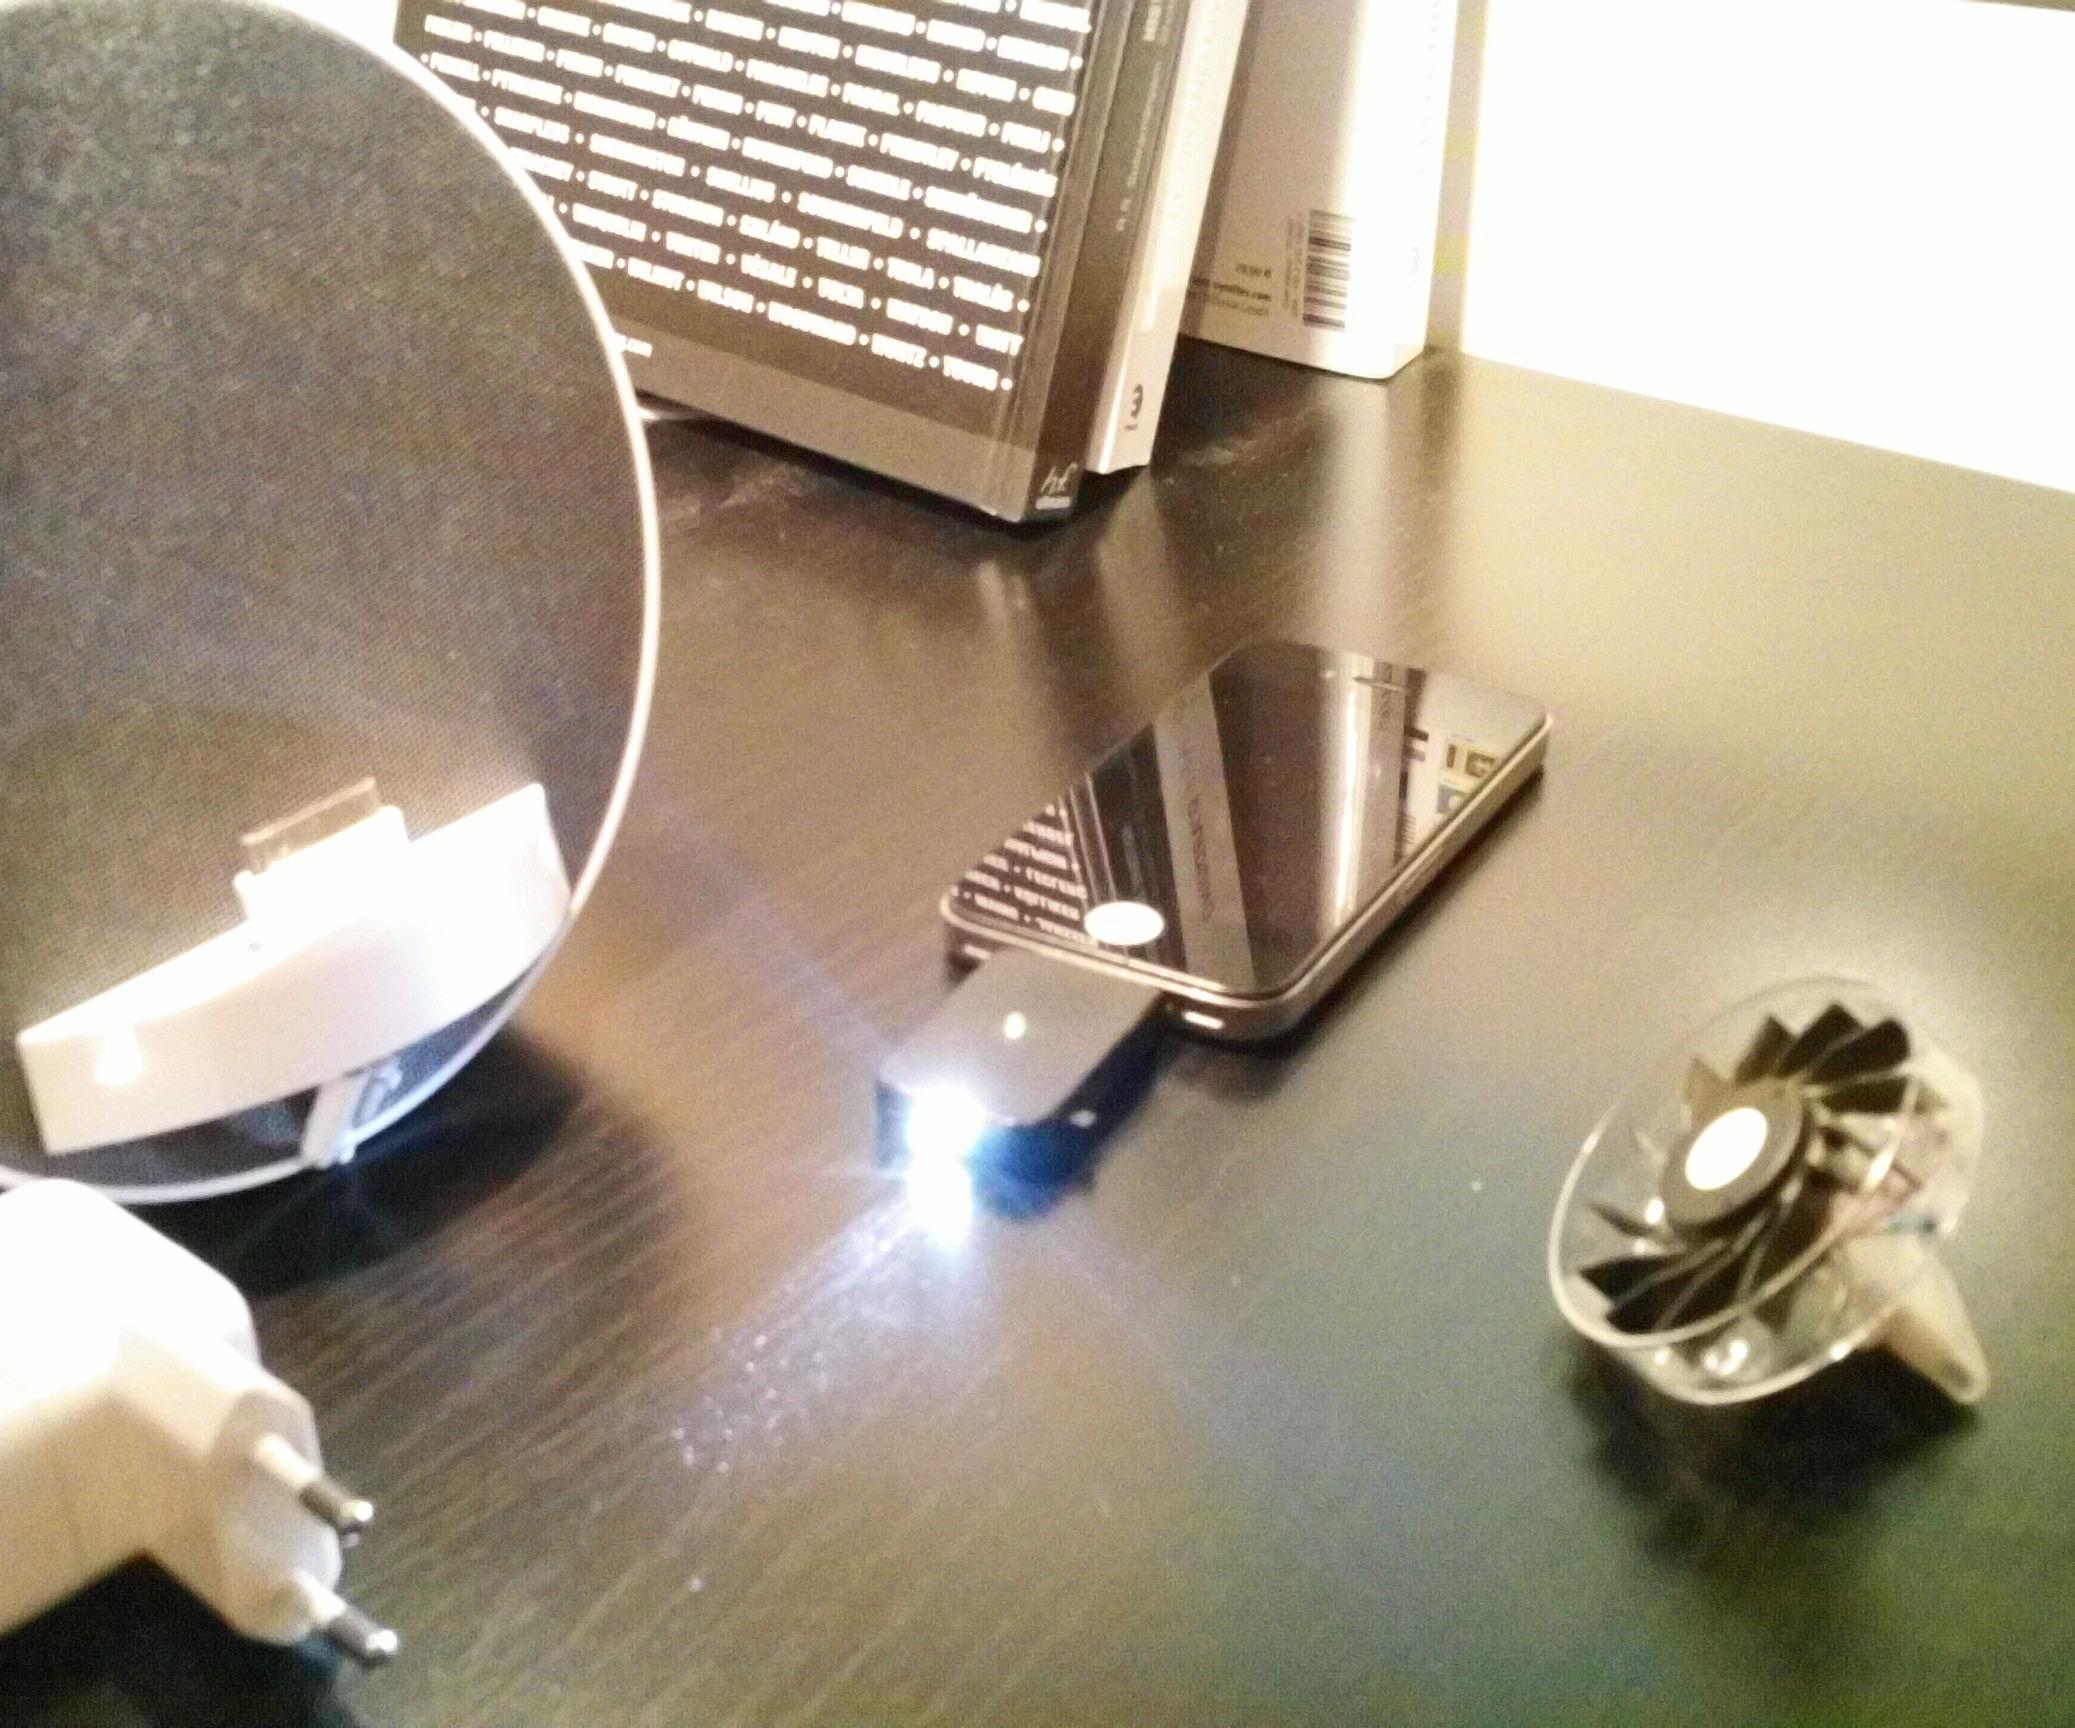 iPhone gadgets (lamp, fan, docking station, etc...)